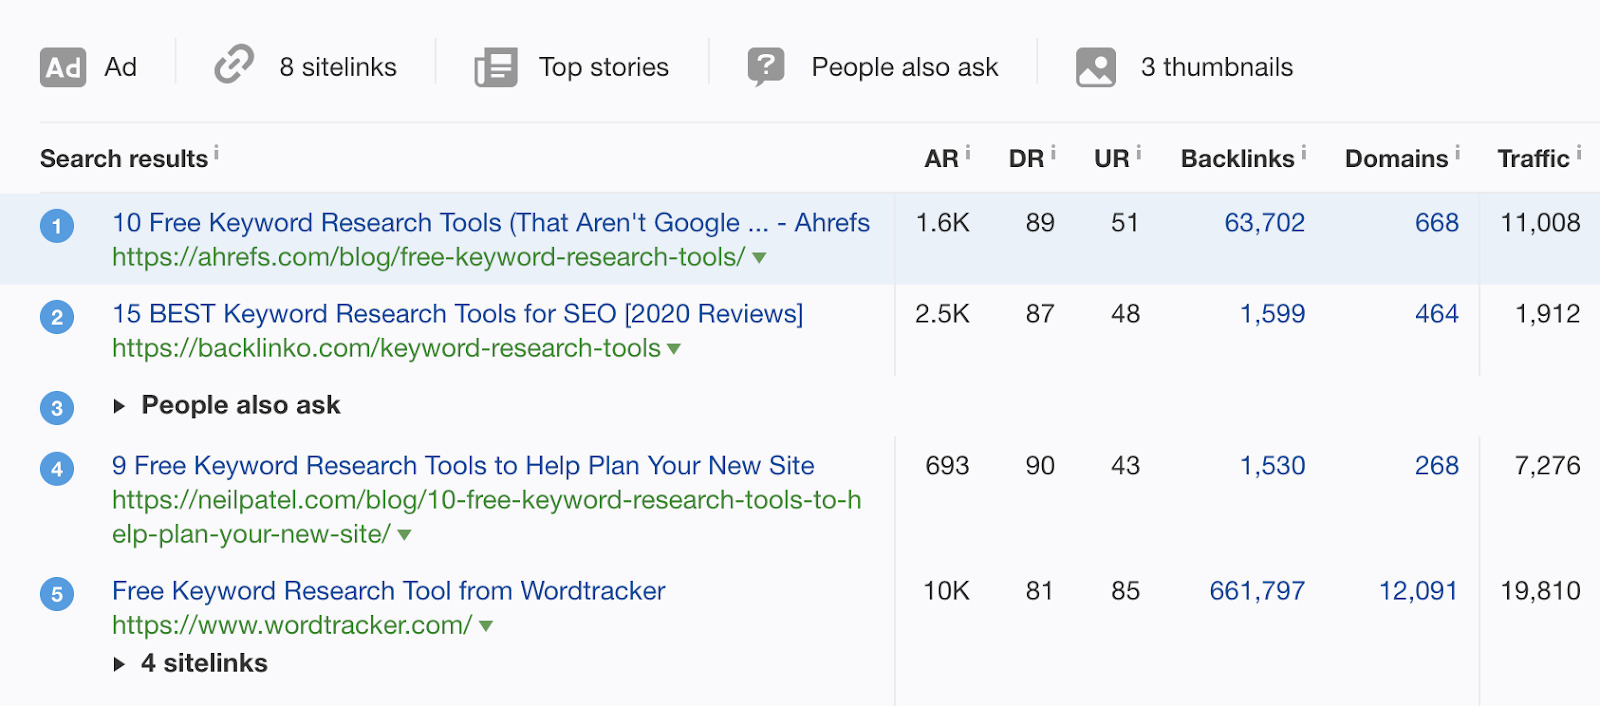 7 keyword research tools ranking